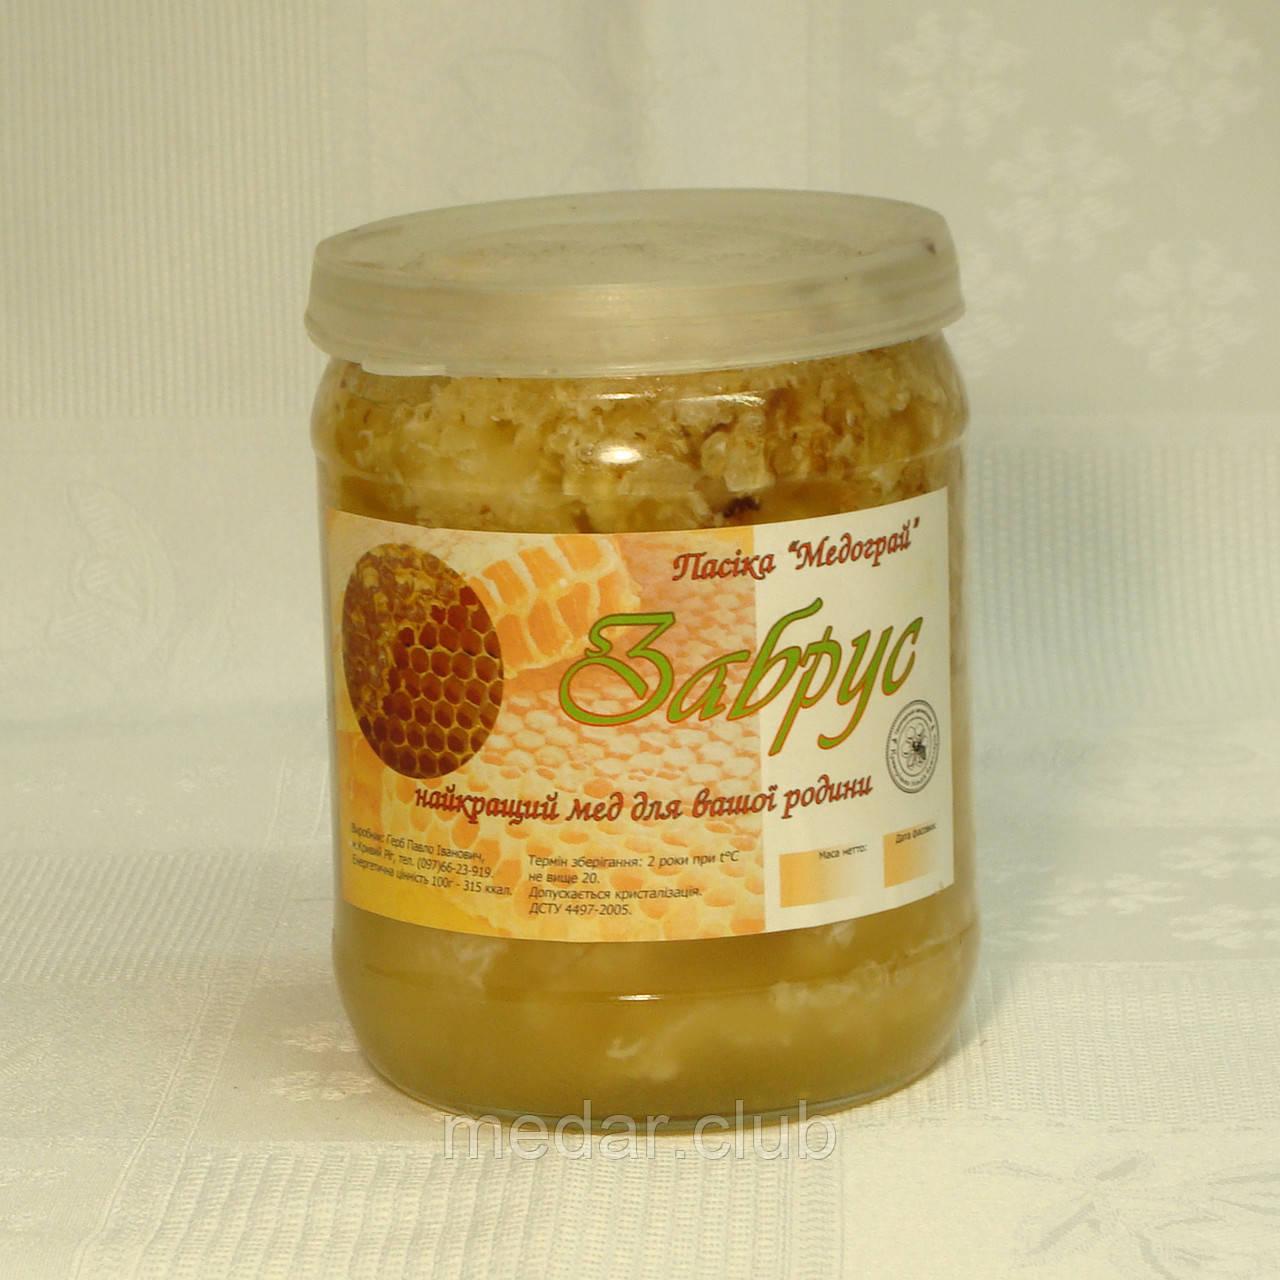 Забрус з меду різнотрав'я, 0,55л